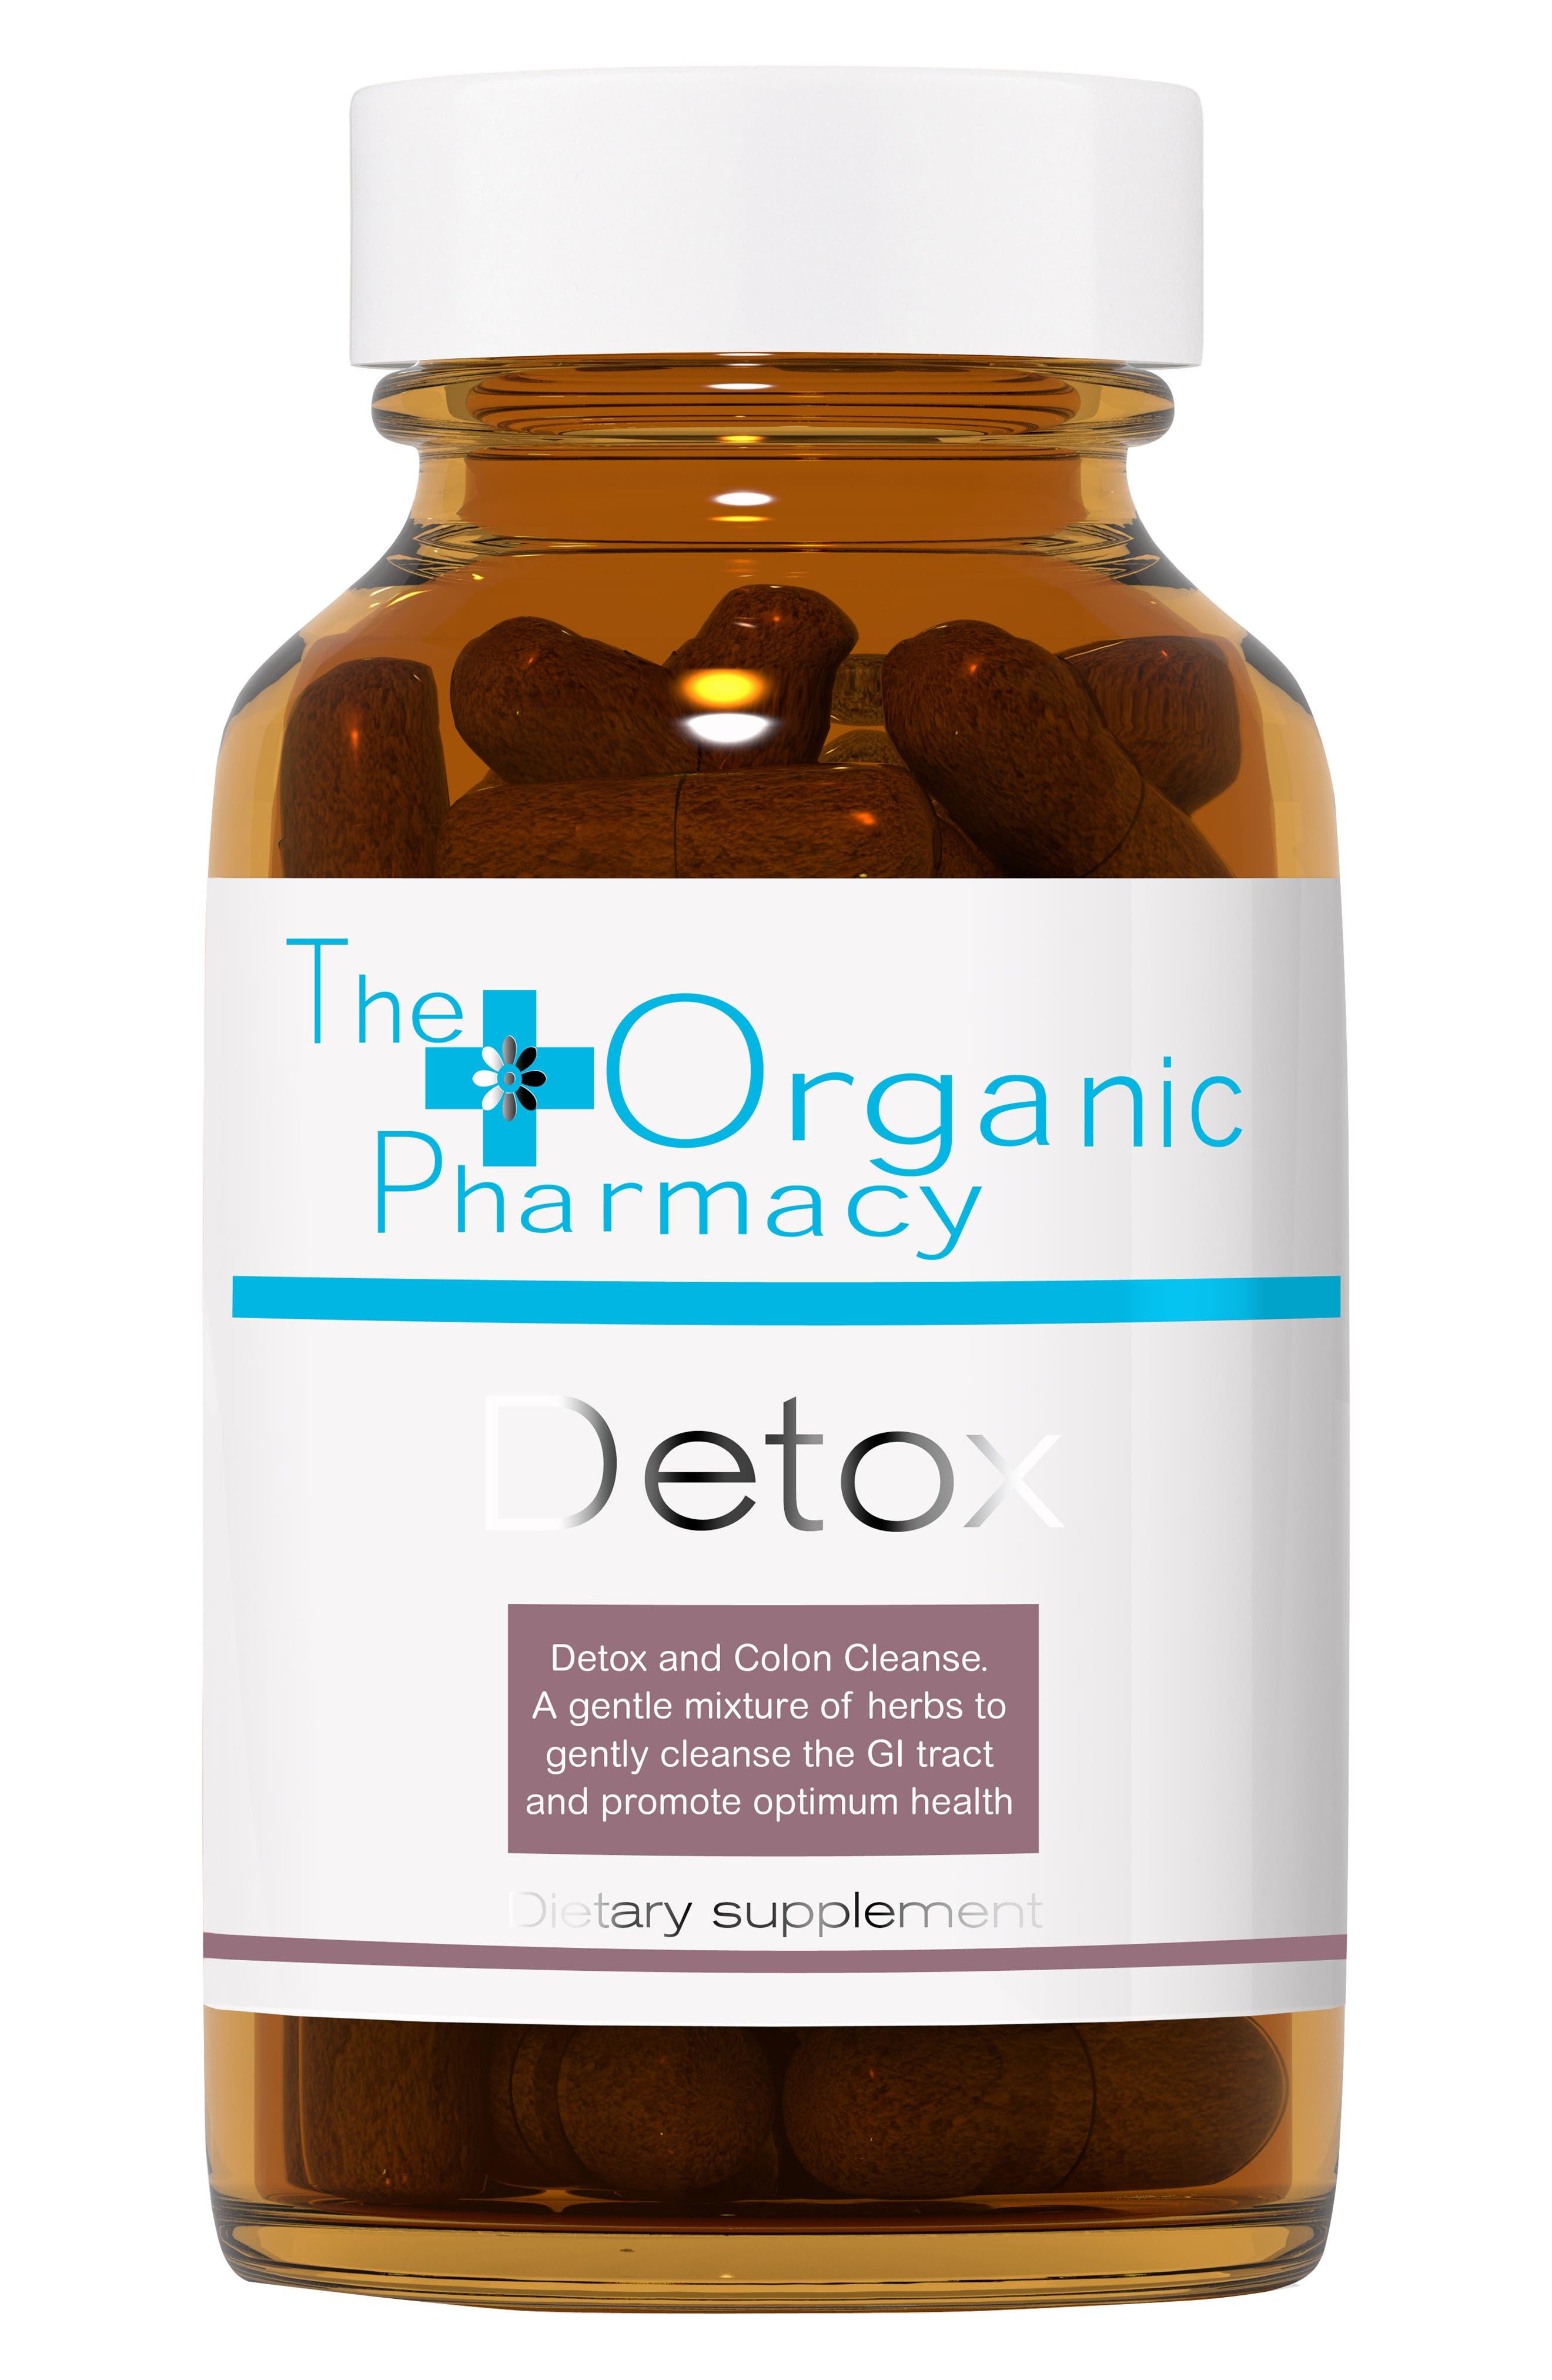 The Organic Pharmacy Detox Capsules